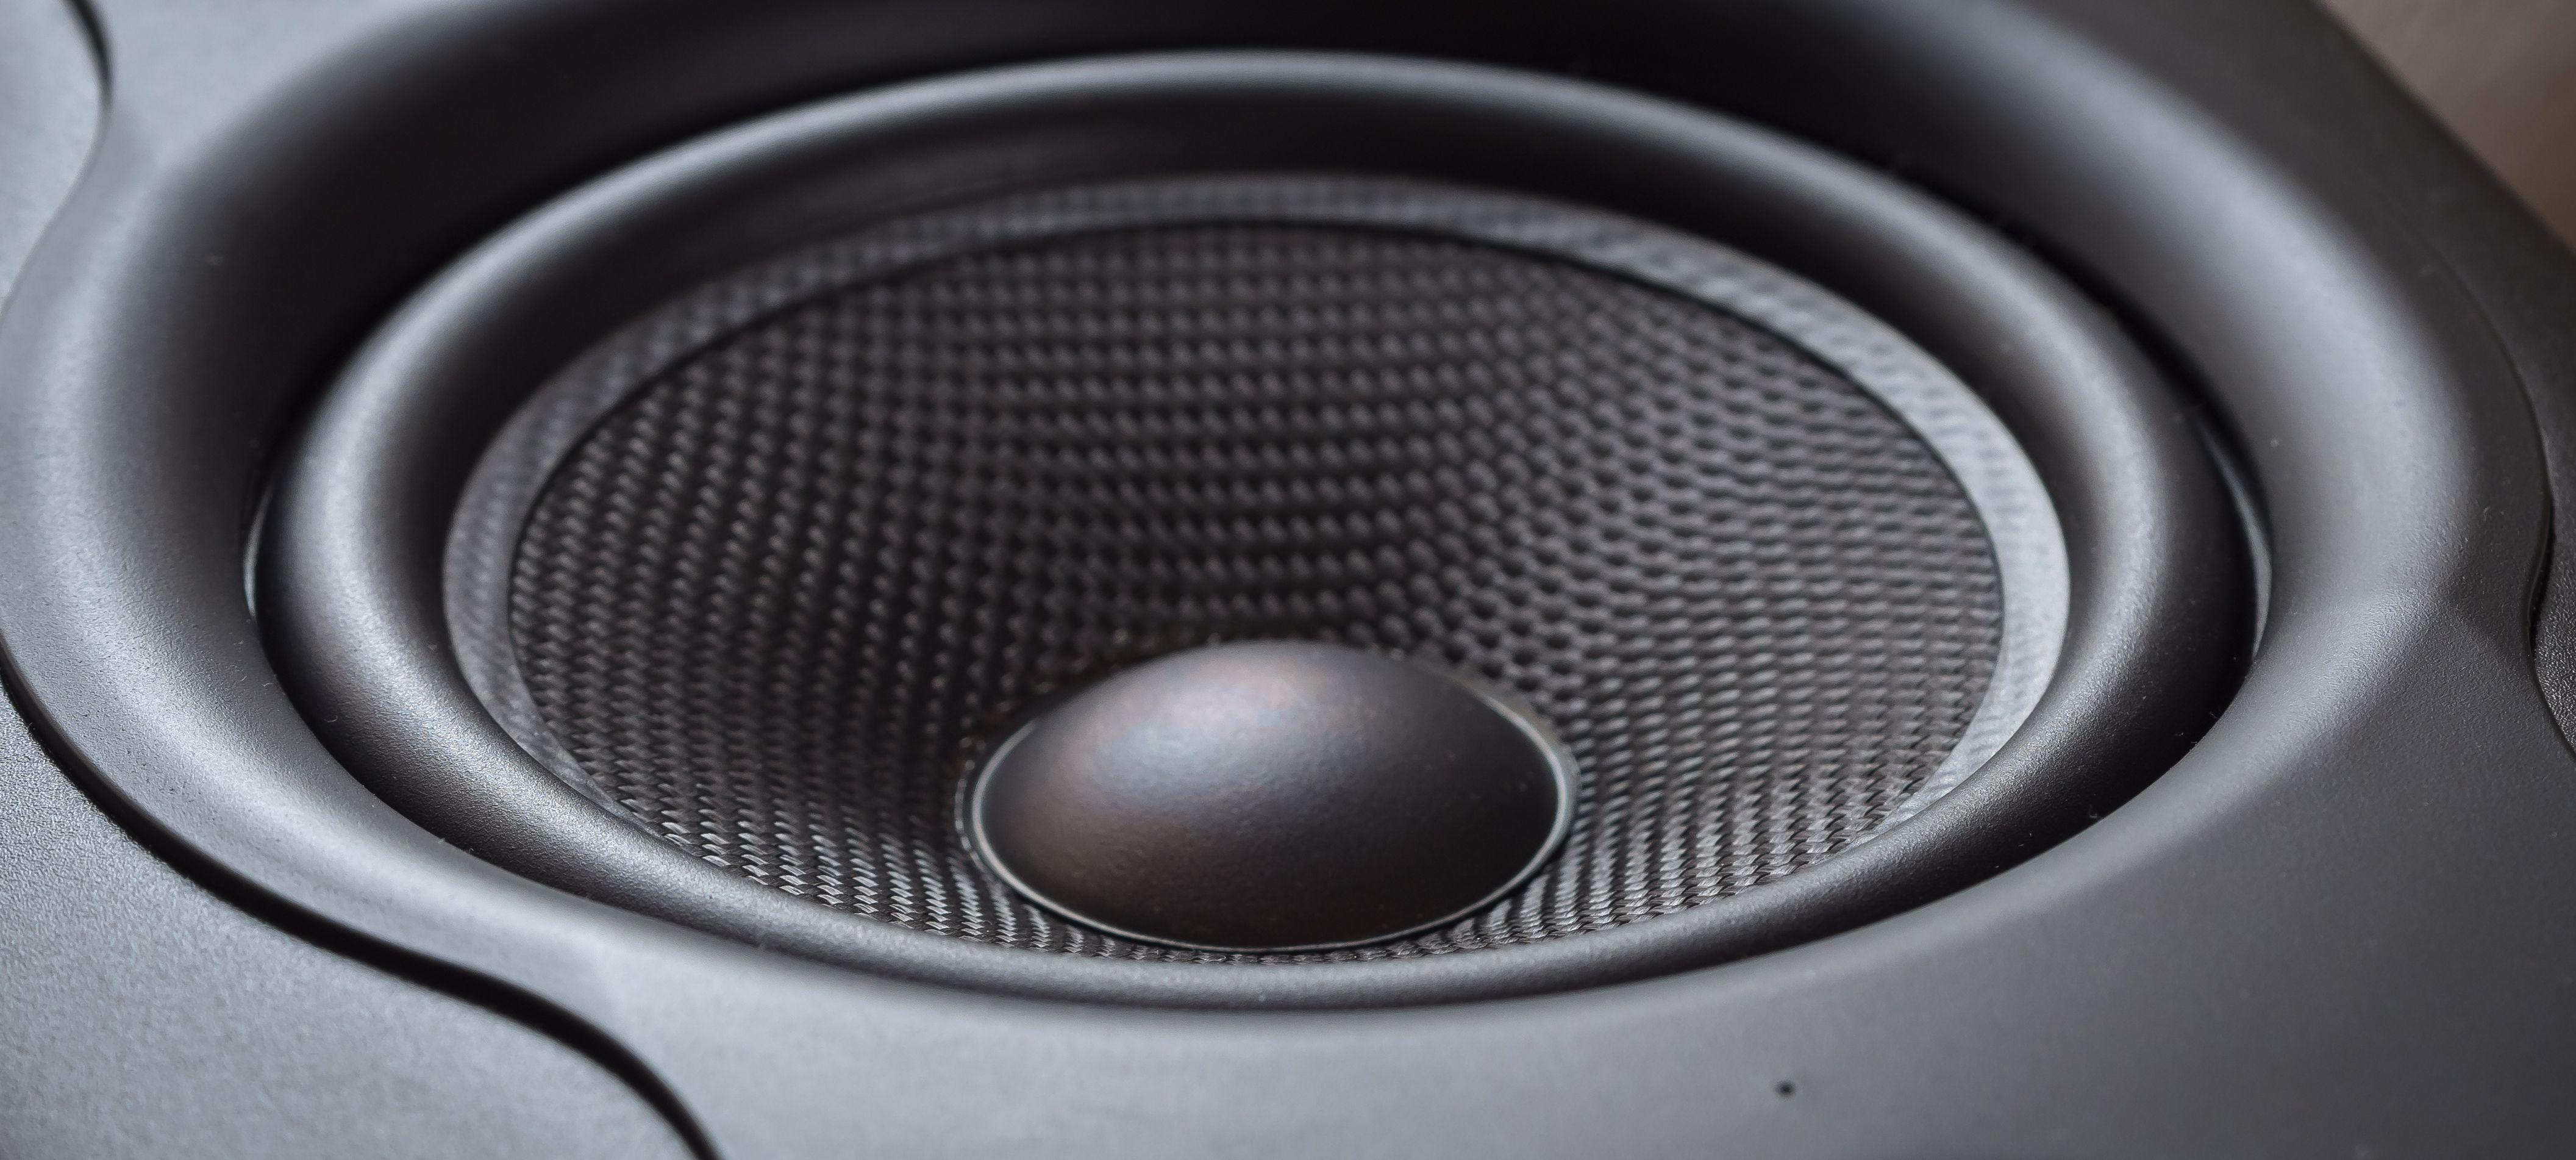 Troubleshooting Diagnose And Eliminate Subwoofer Hum Polk Audio Car Wiring Kits